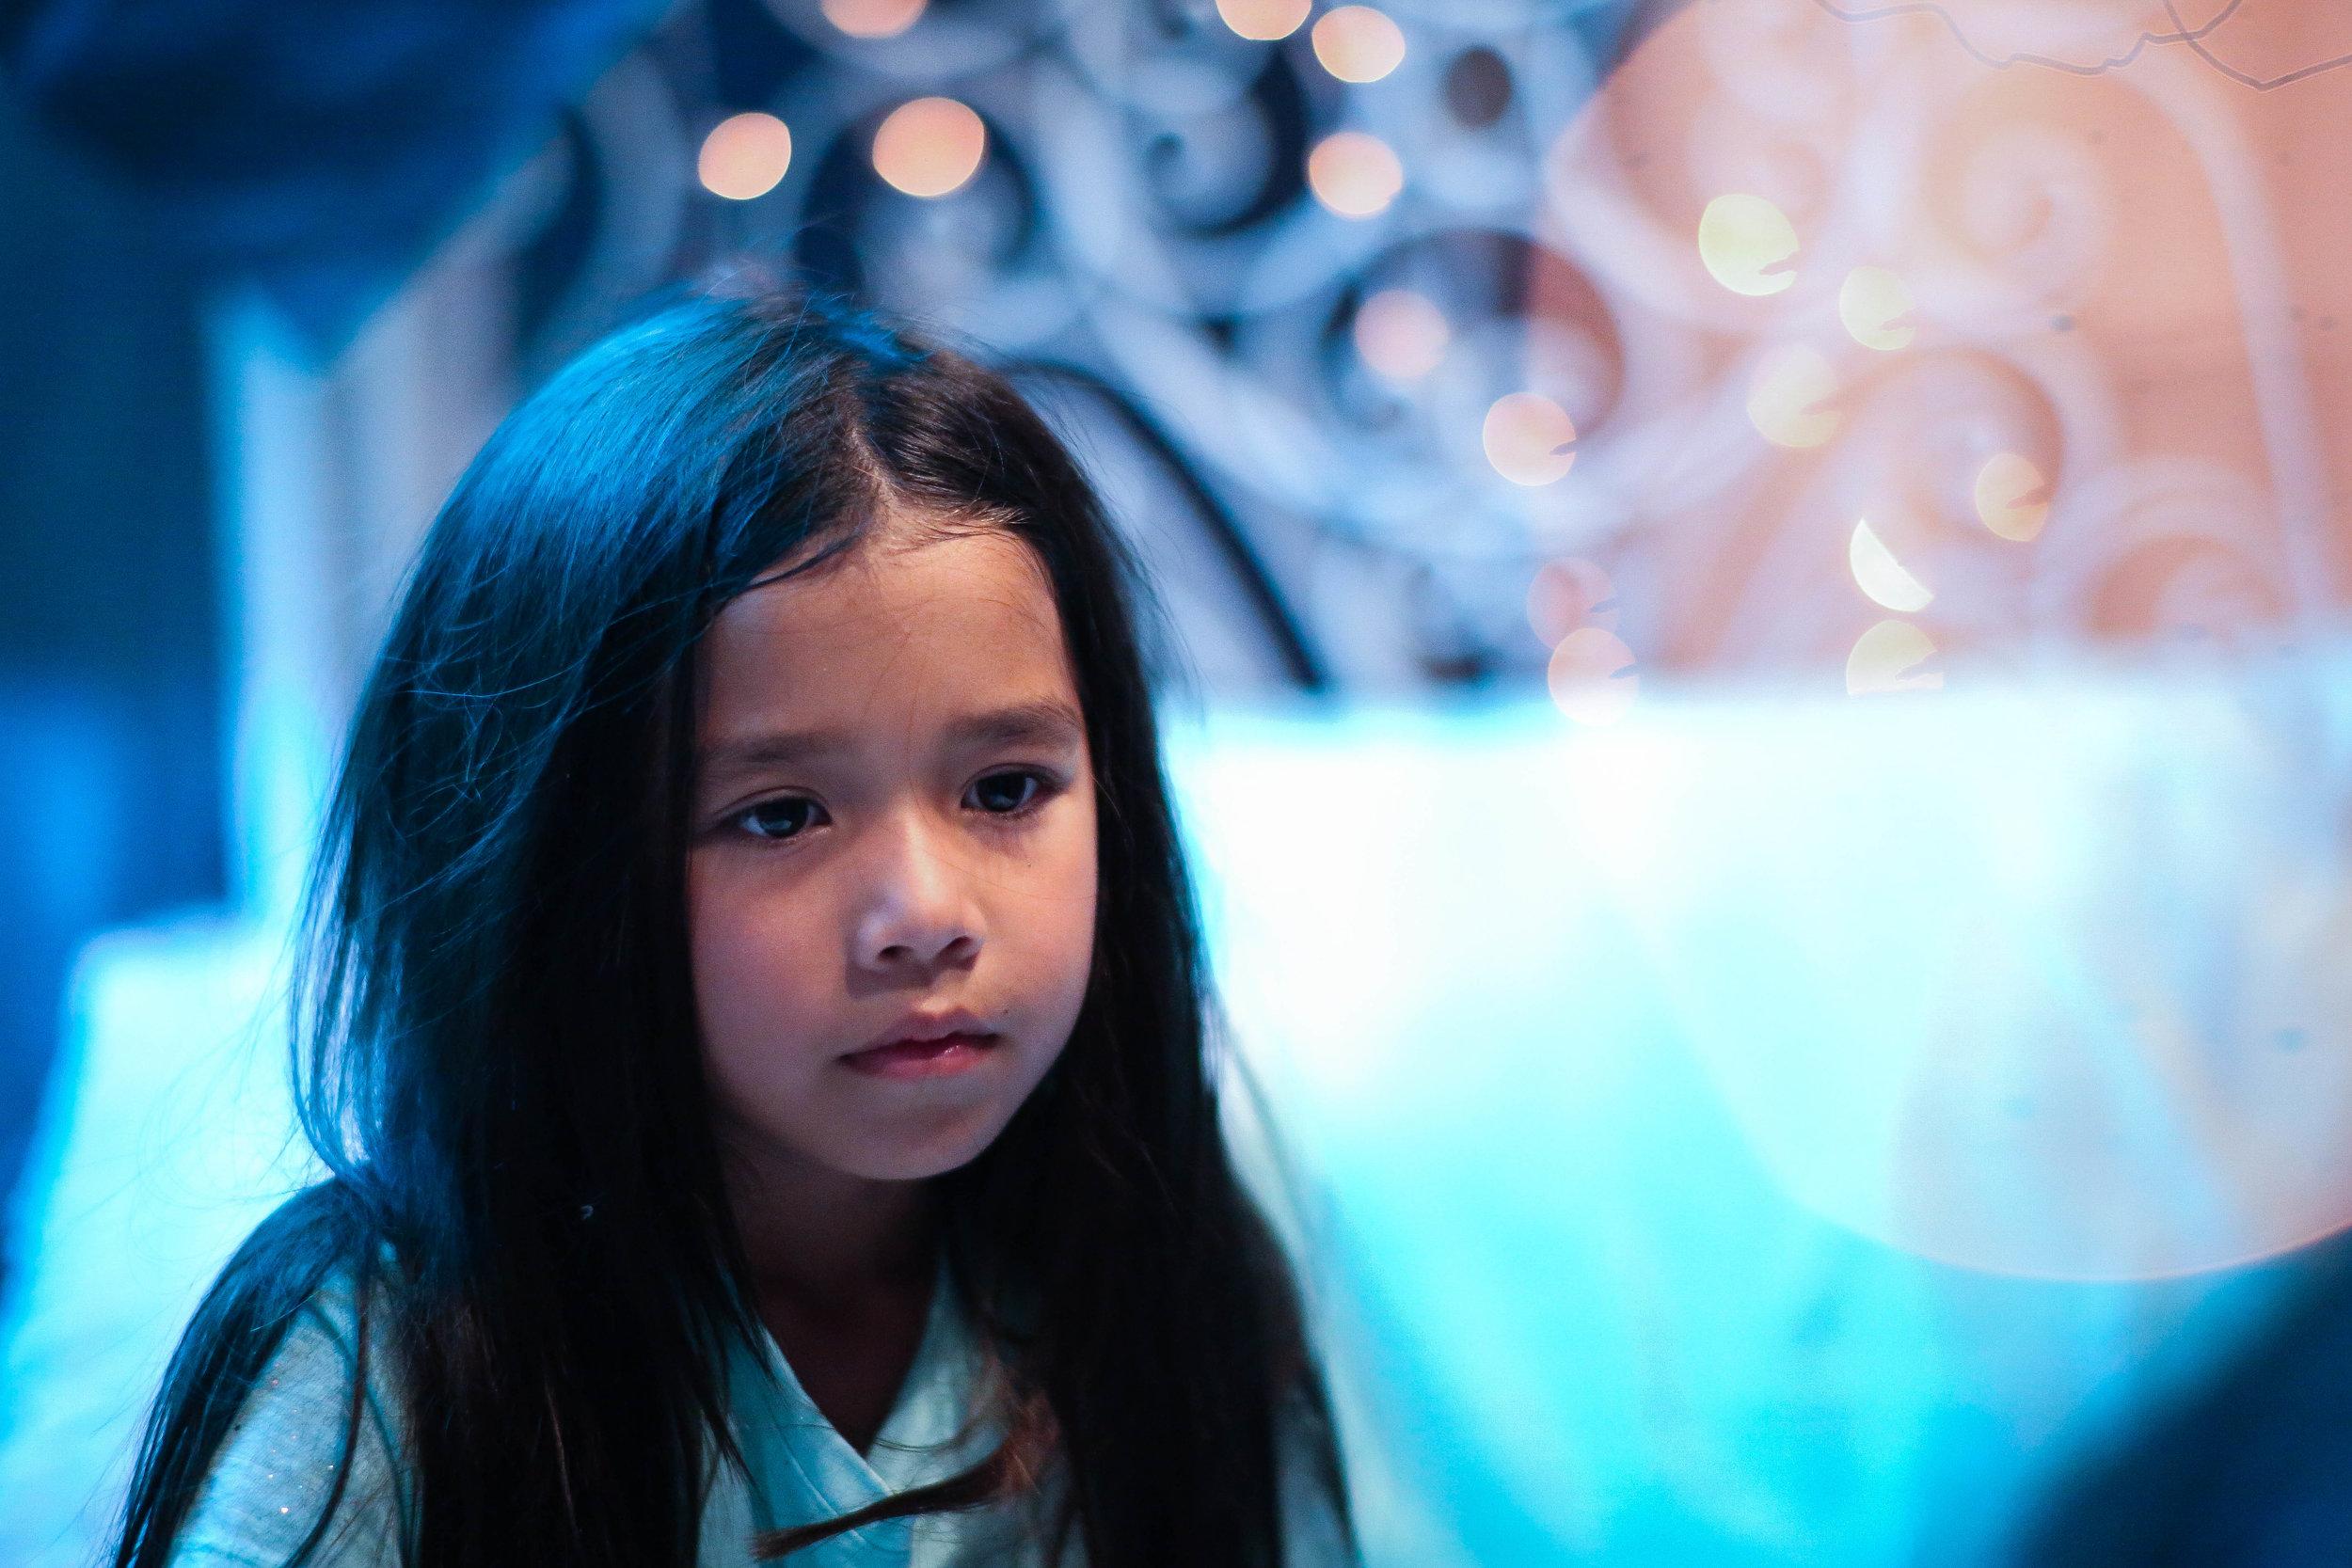 Mai Brunelle as Young Ella. Photo credit Di Wei.